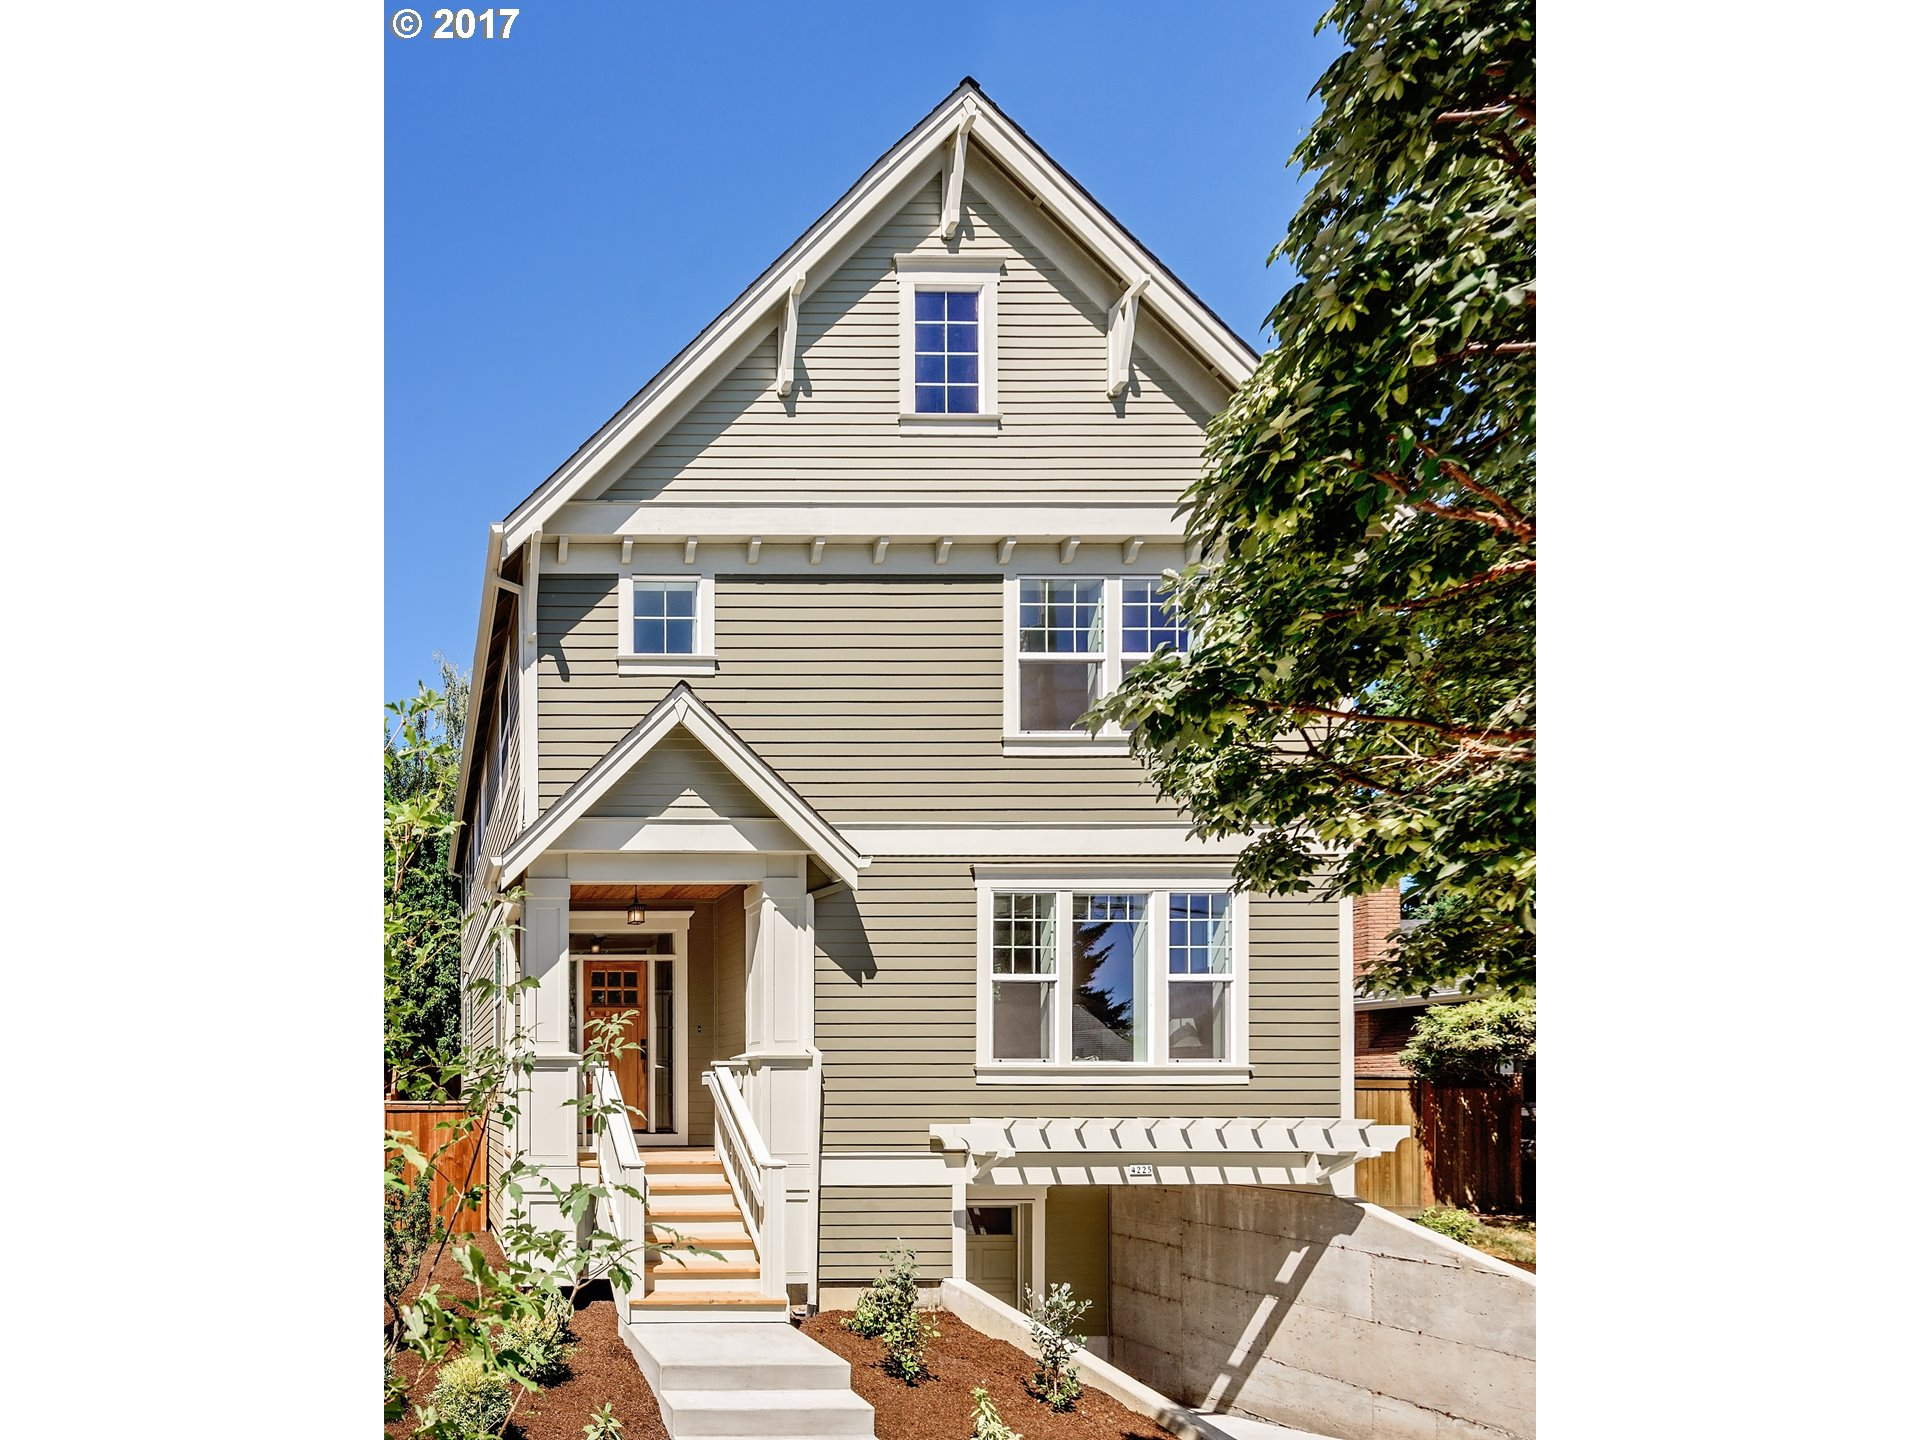 4225 SE LEXINGTON ST Portland, OR 97206 - MLS #: 17500373